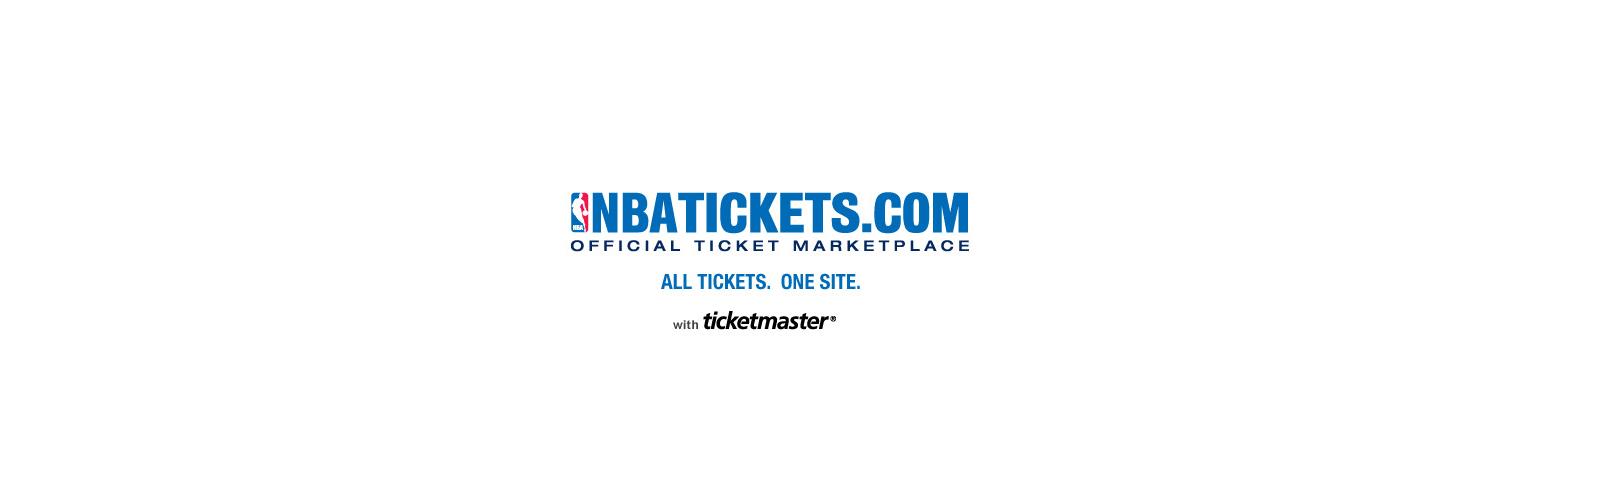 nba-tickets